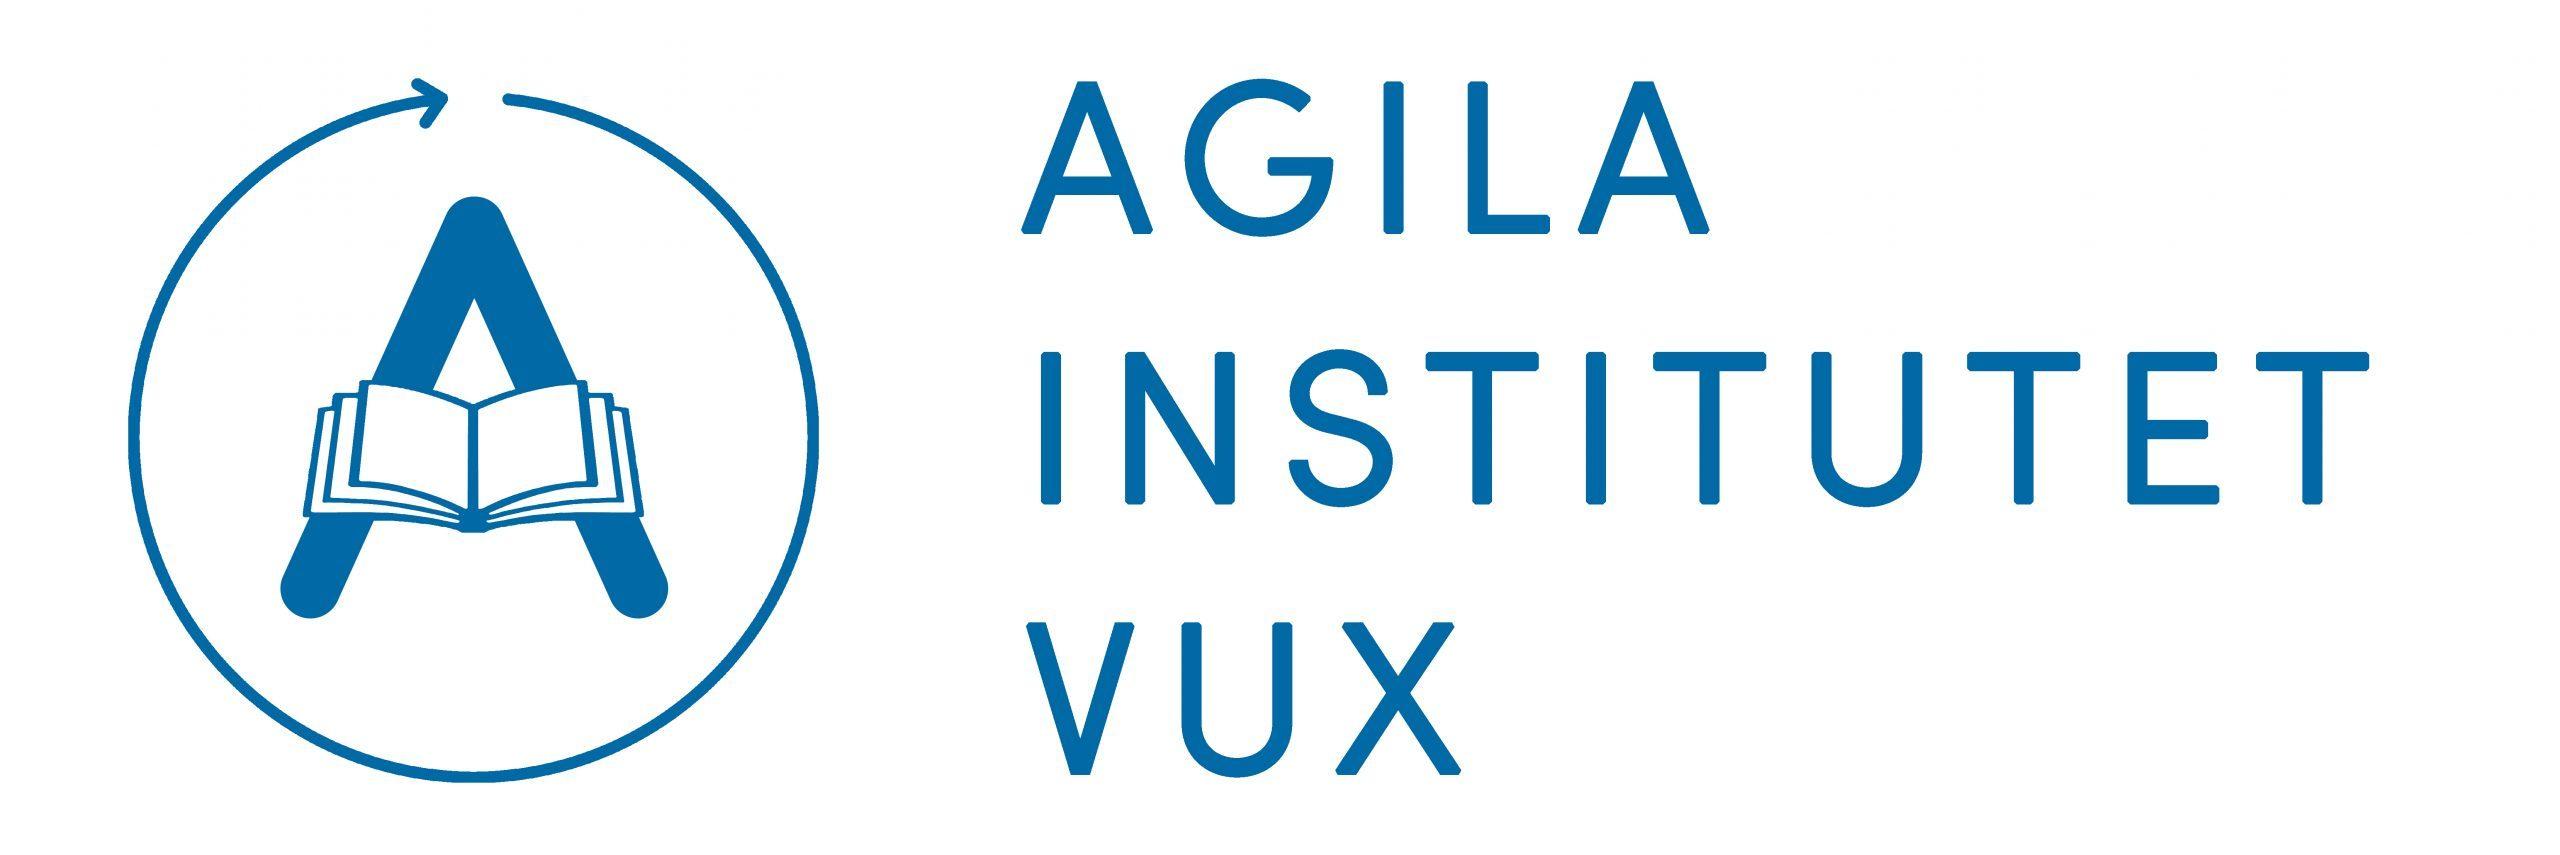 Agila Institutet VUX